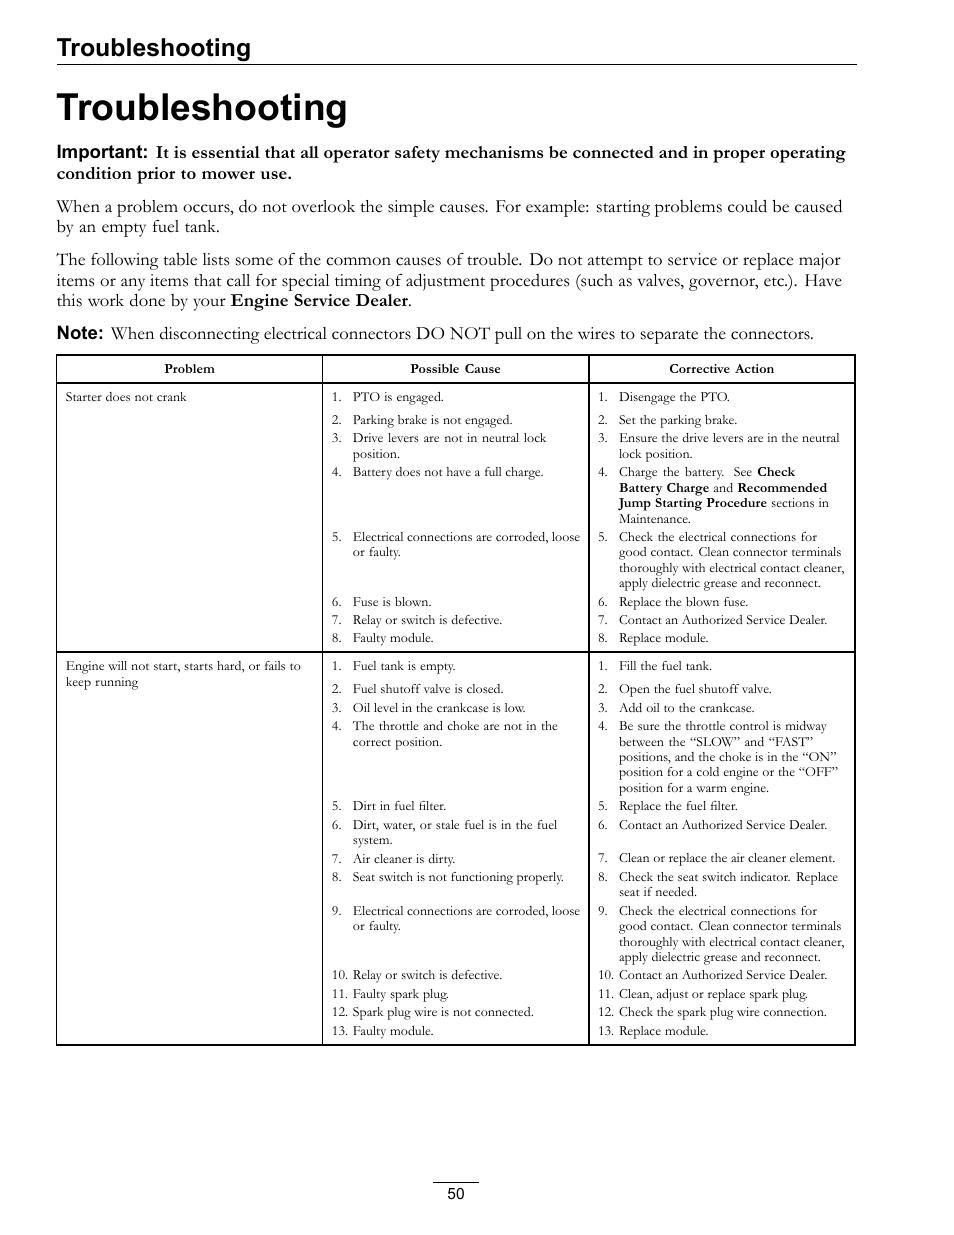 Troubleshooting | Exmark Lazer Z Advantage Series X User Manual